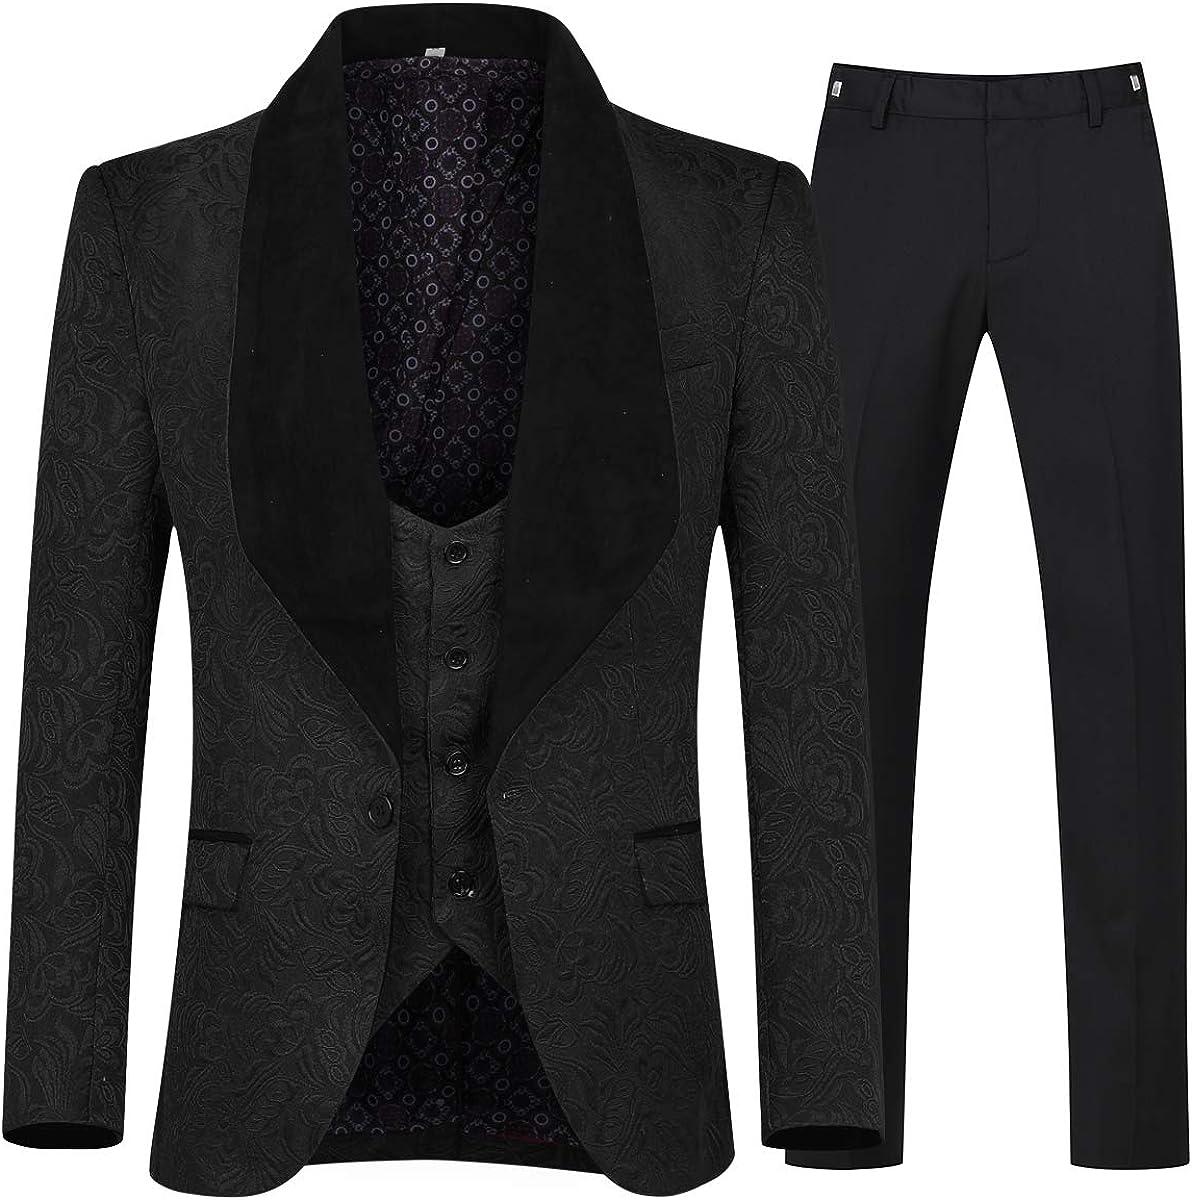 YFFUSHI Men's 3 Piece Max 79% OFF Suit Slim Tuxedo One Free shipping Fit Jacquard Button S